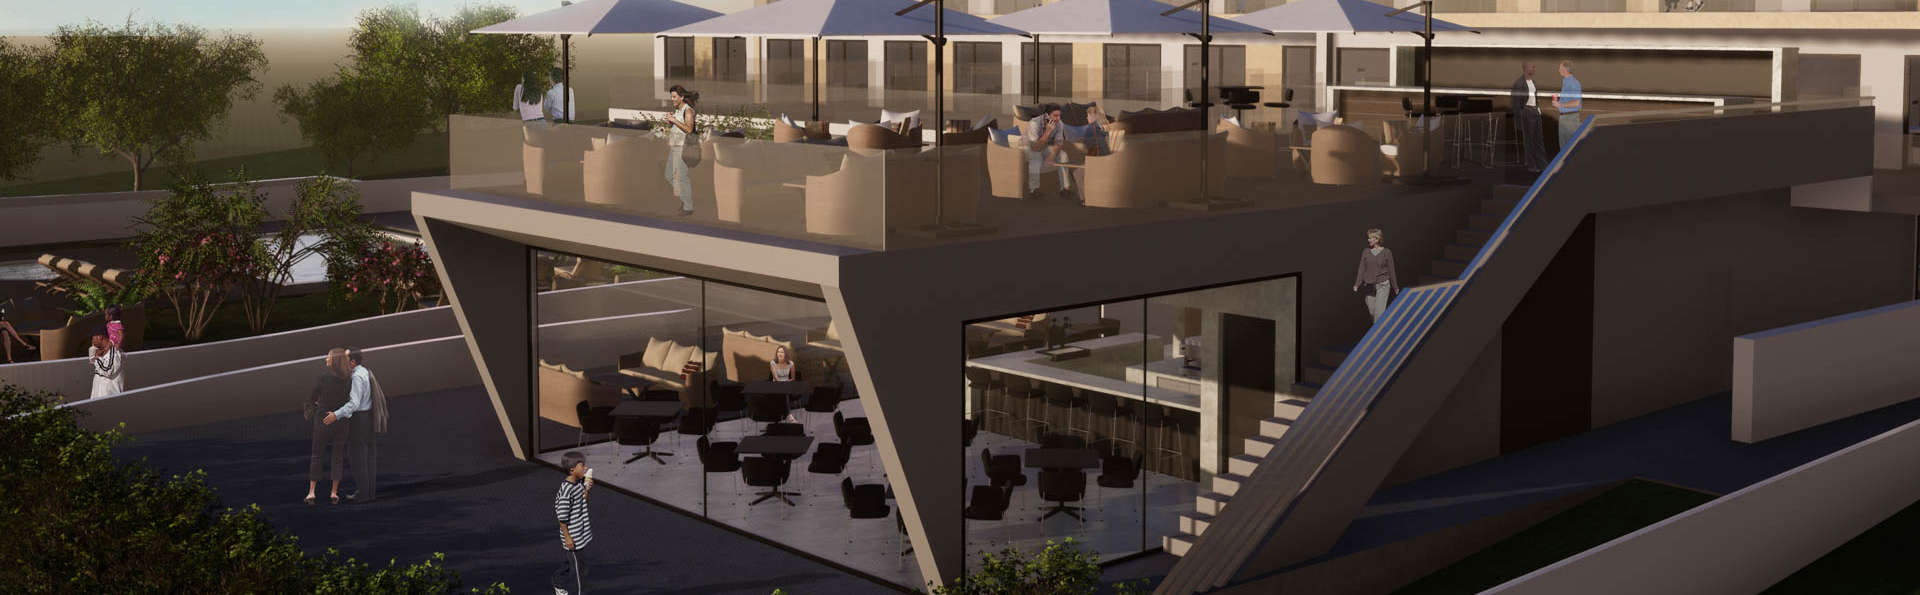 Oca Playa de Foz Hotel&Spa - EDIT_RENDER_OCA_PLAYA_DE_FOZ_HOTEL___SPA-4.jpg